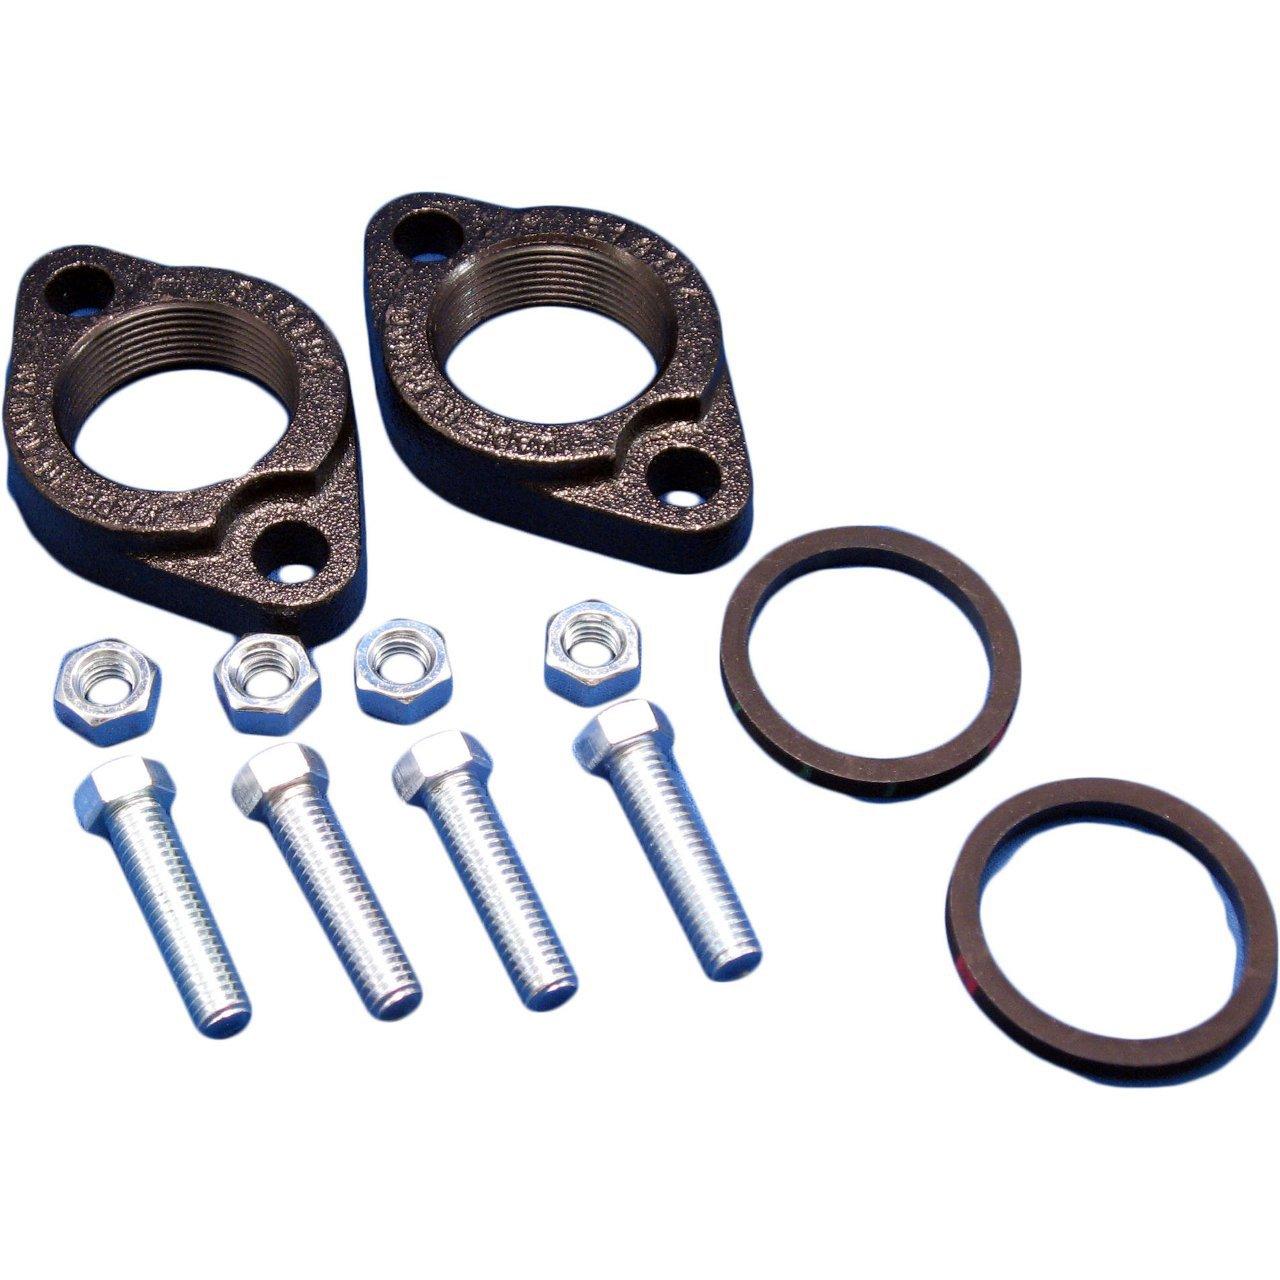 "Grundfos 519604 1-1/2"" Npt Cast Iron Circulator Pump Packaged Flange Set"